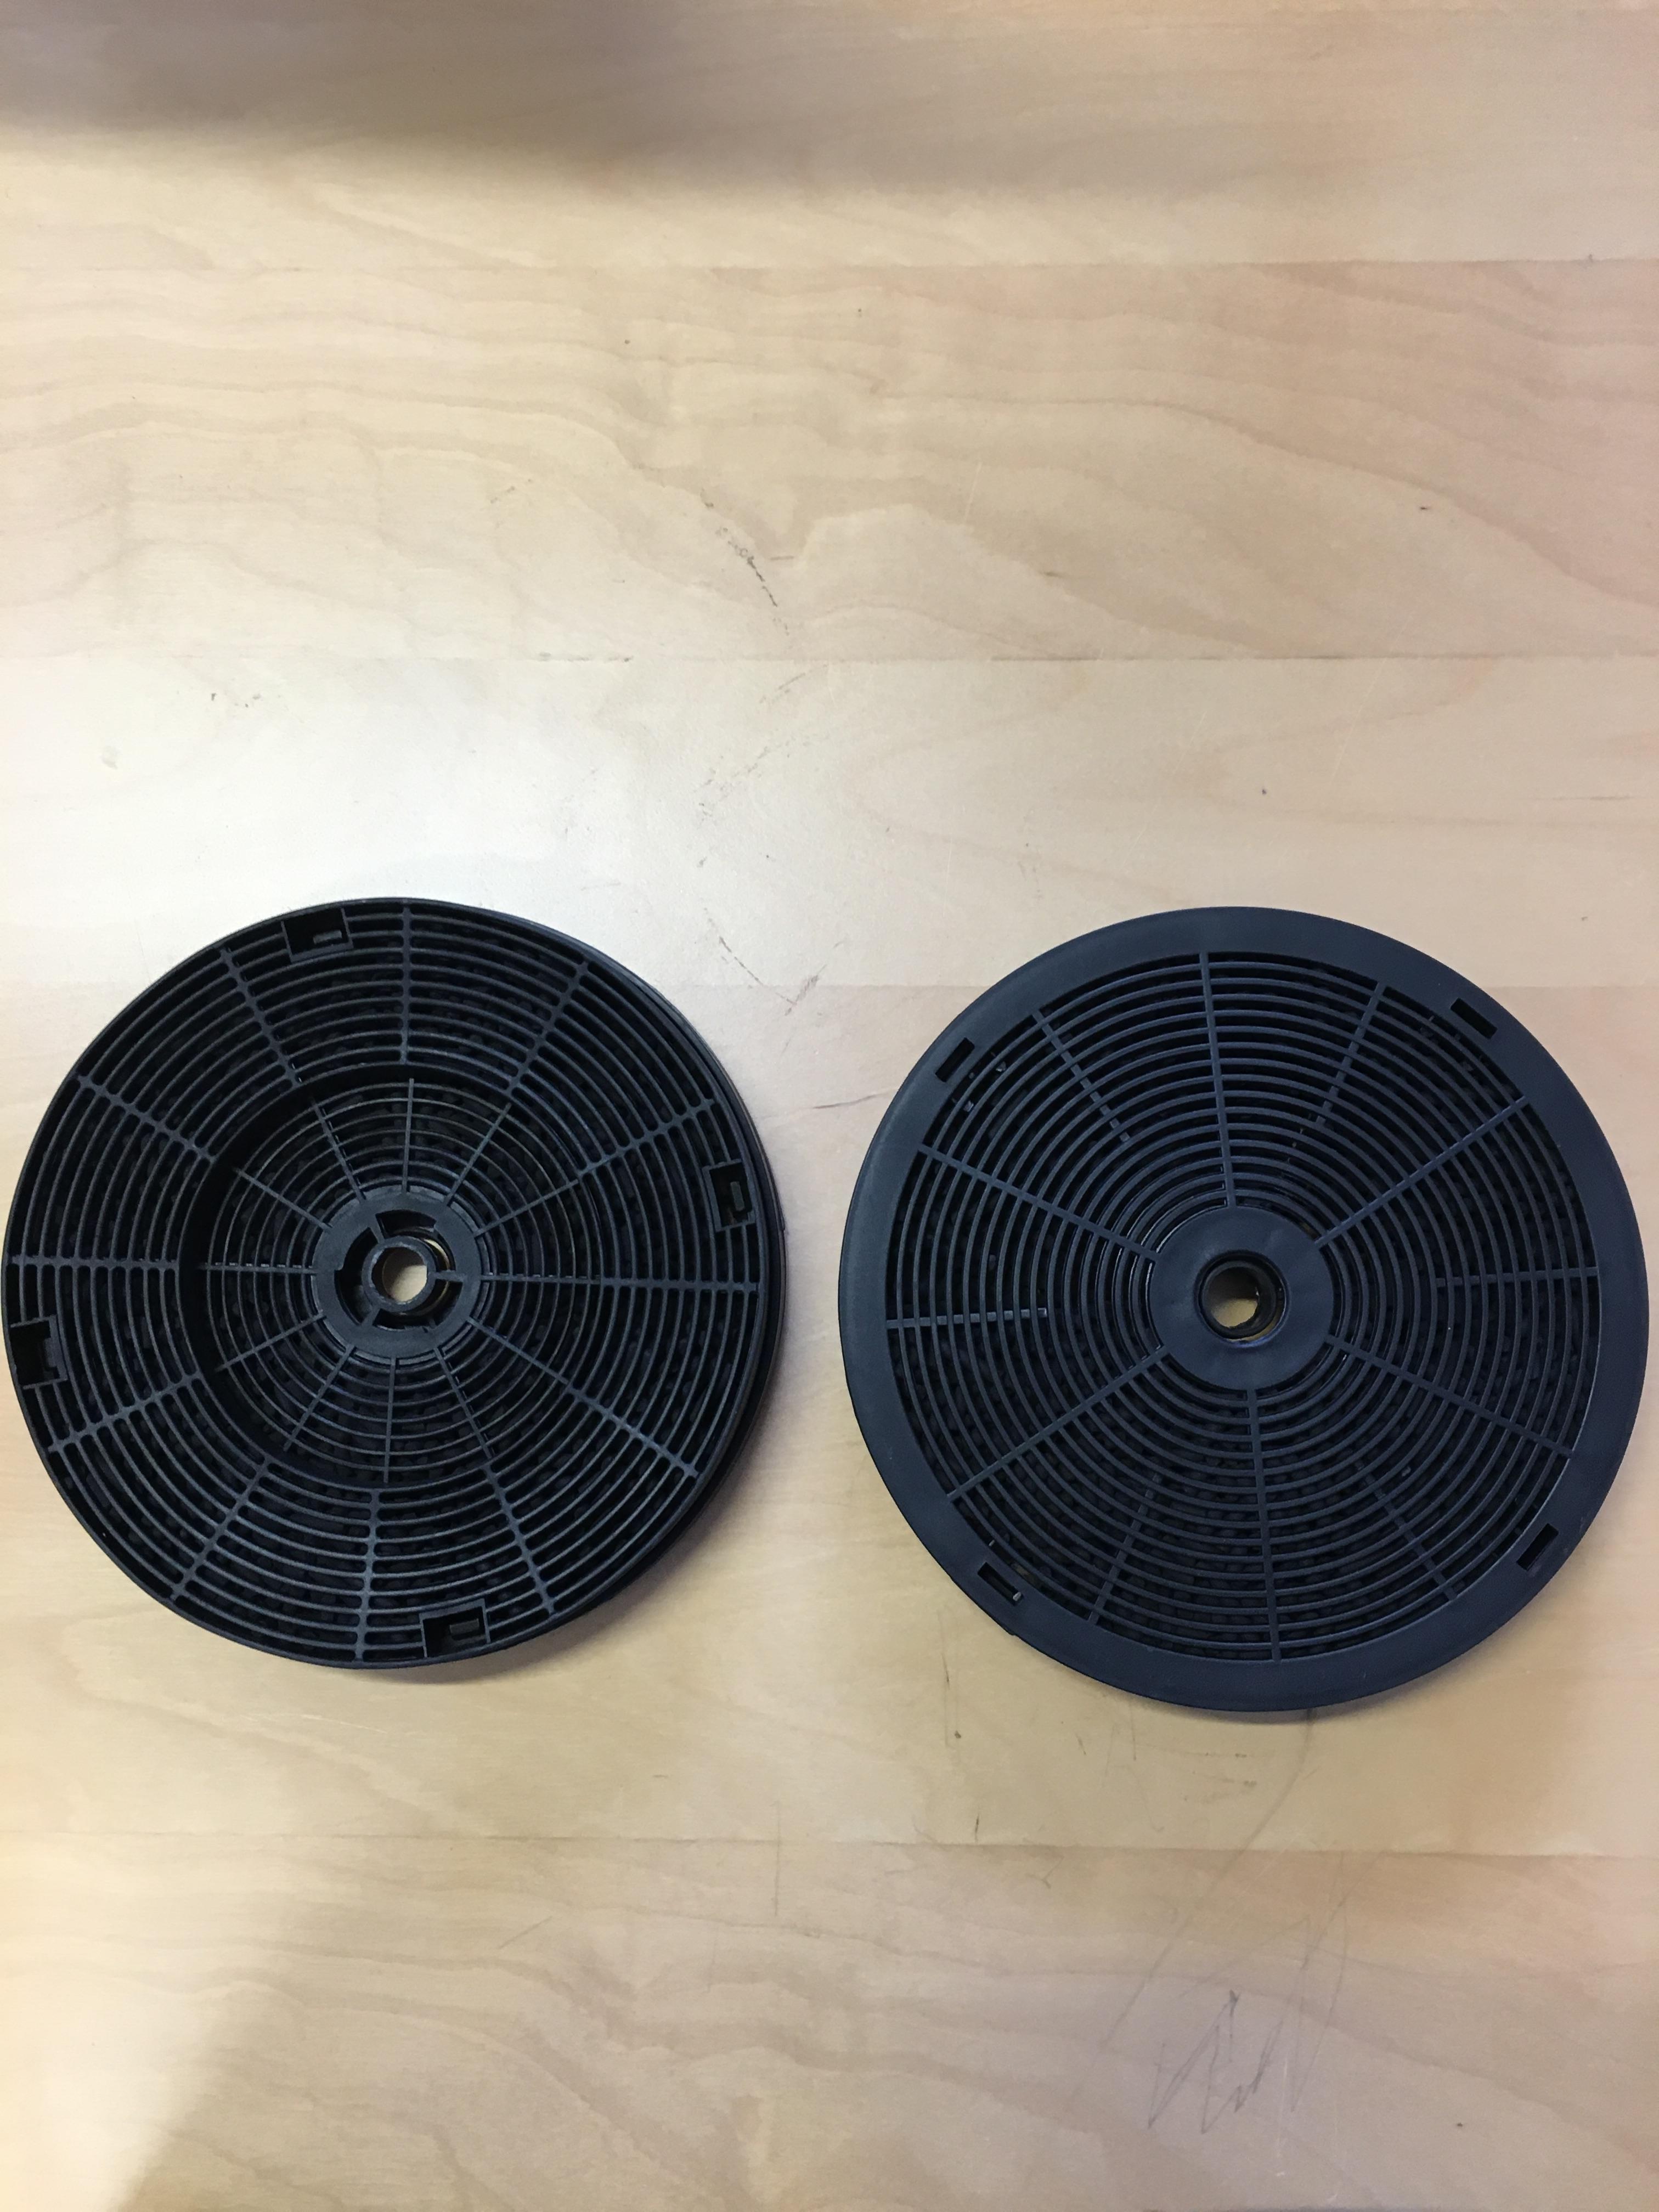 Kohle Filter für Dunstabzugshaube Amica UH 17010 E